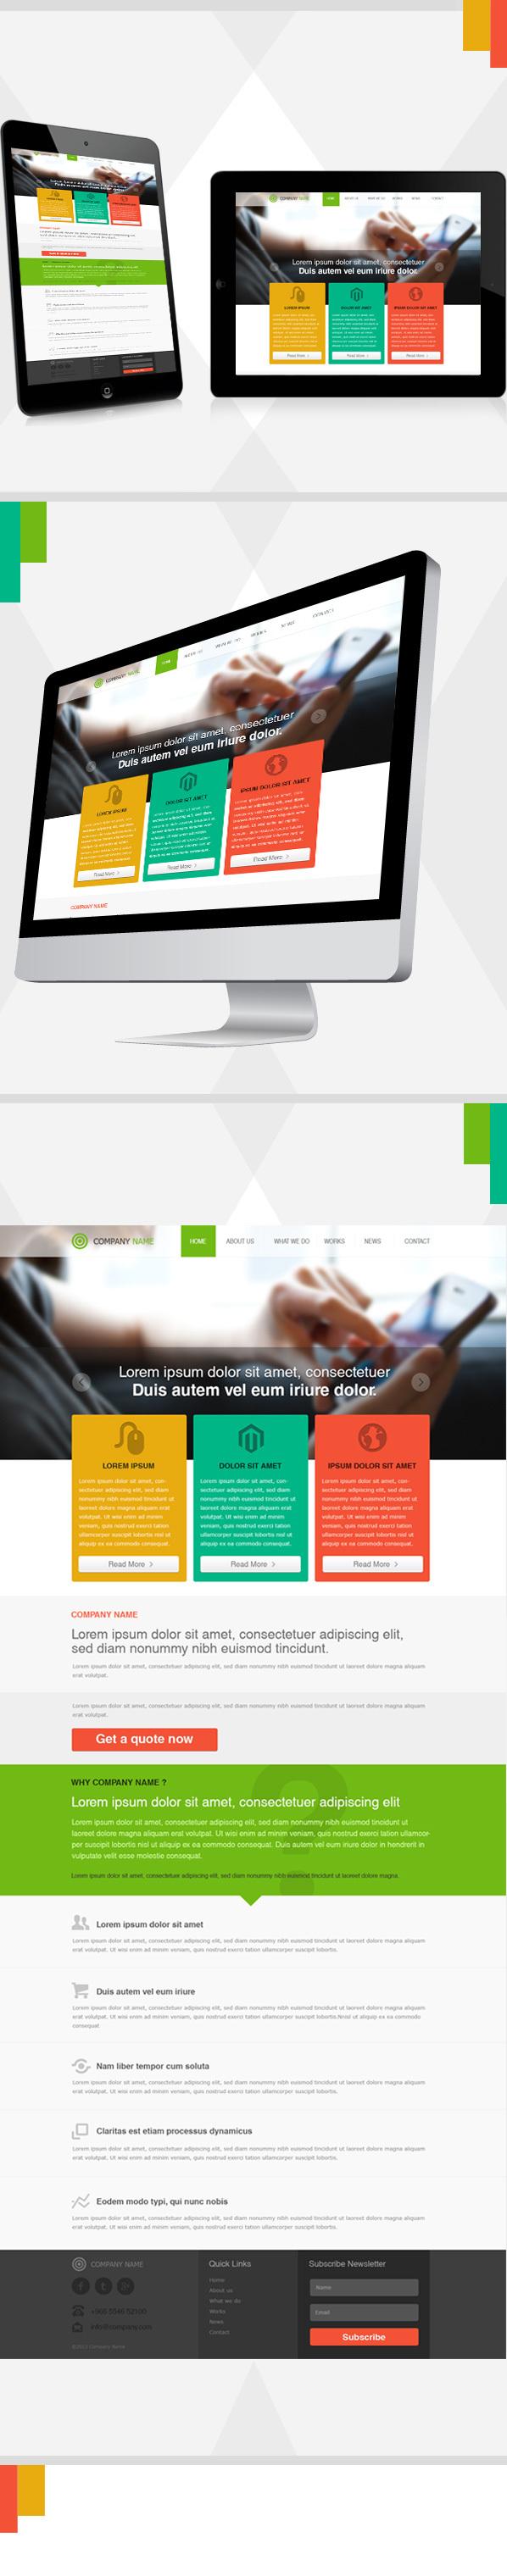 design template by monish via behance web inspiration design